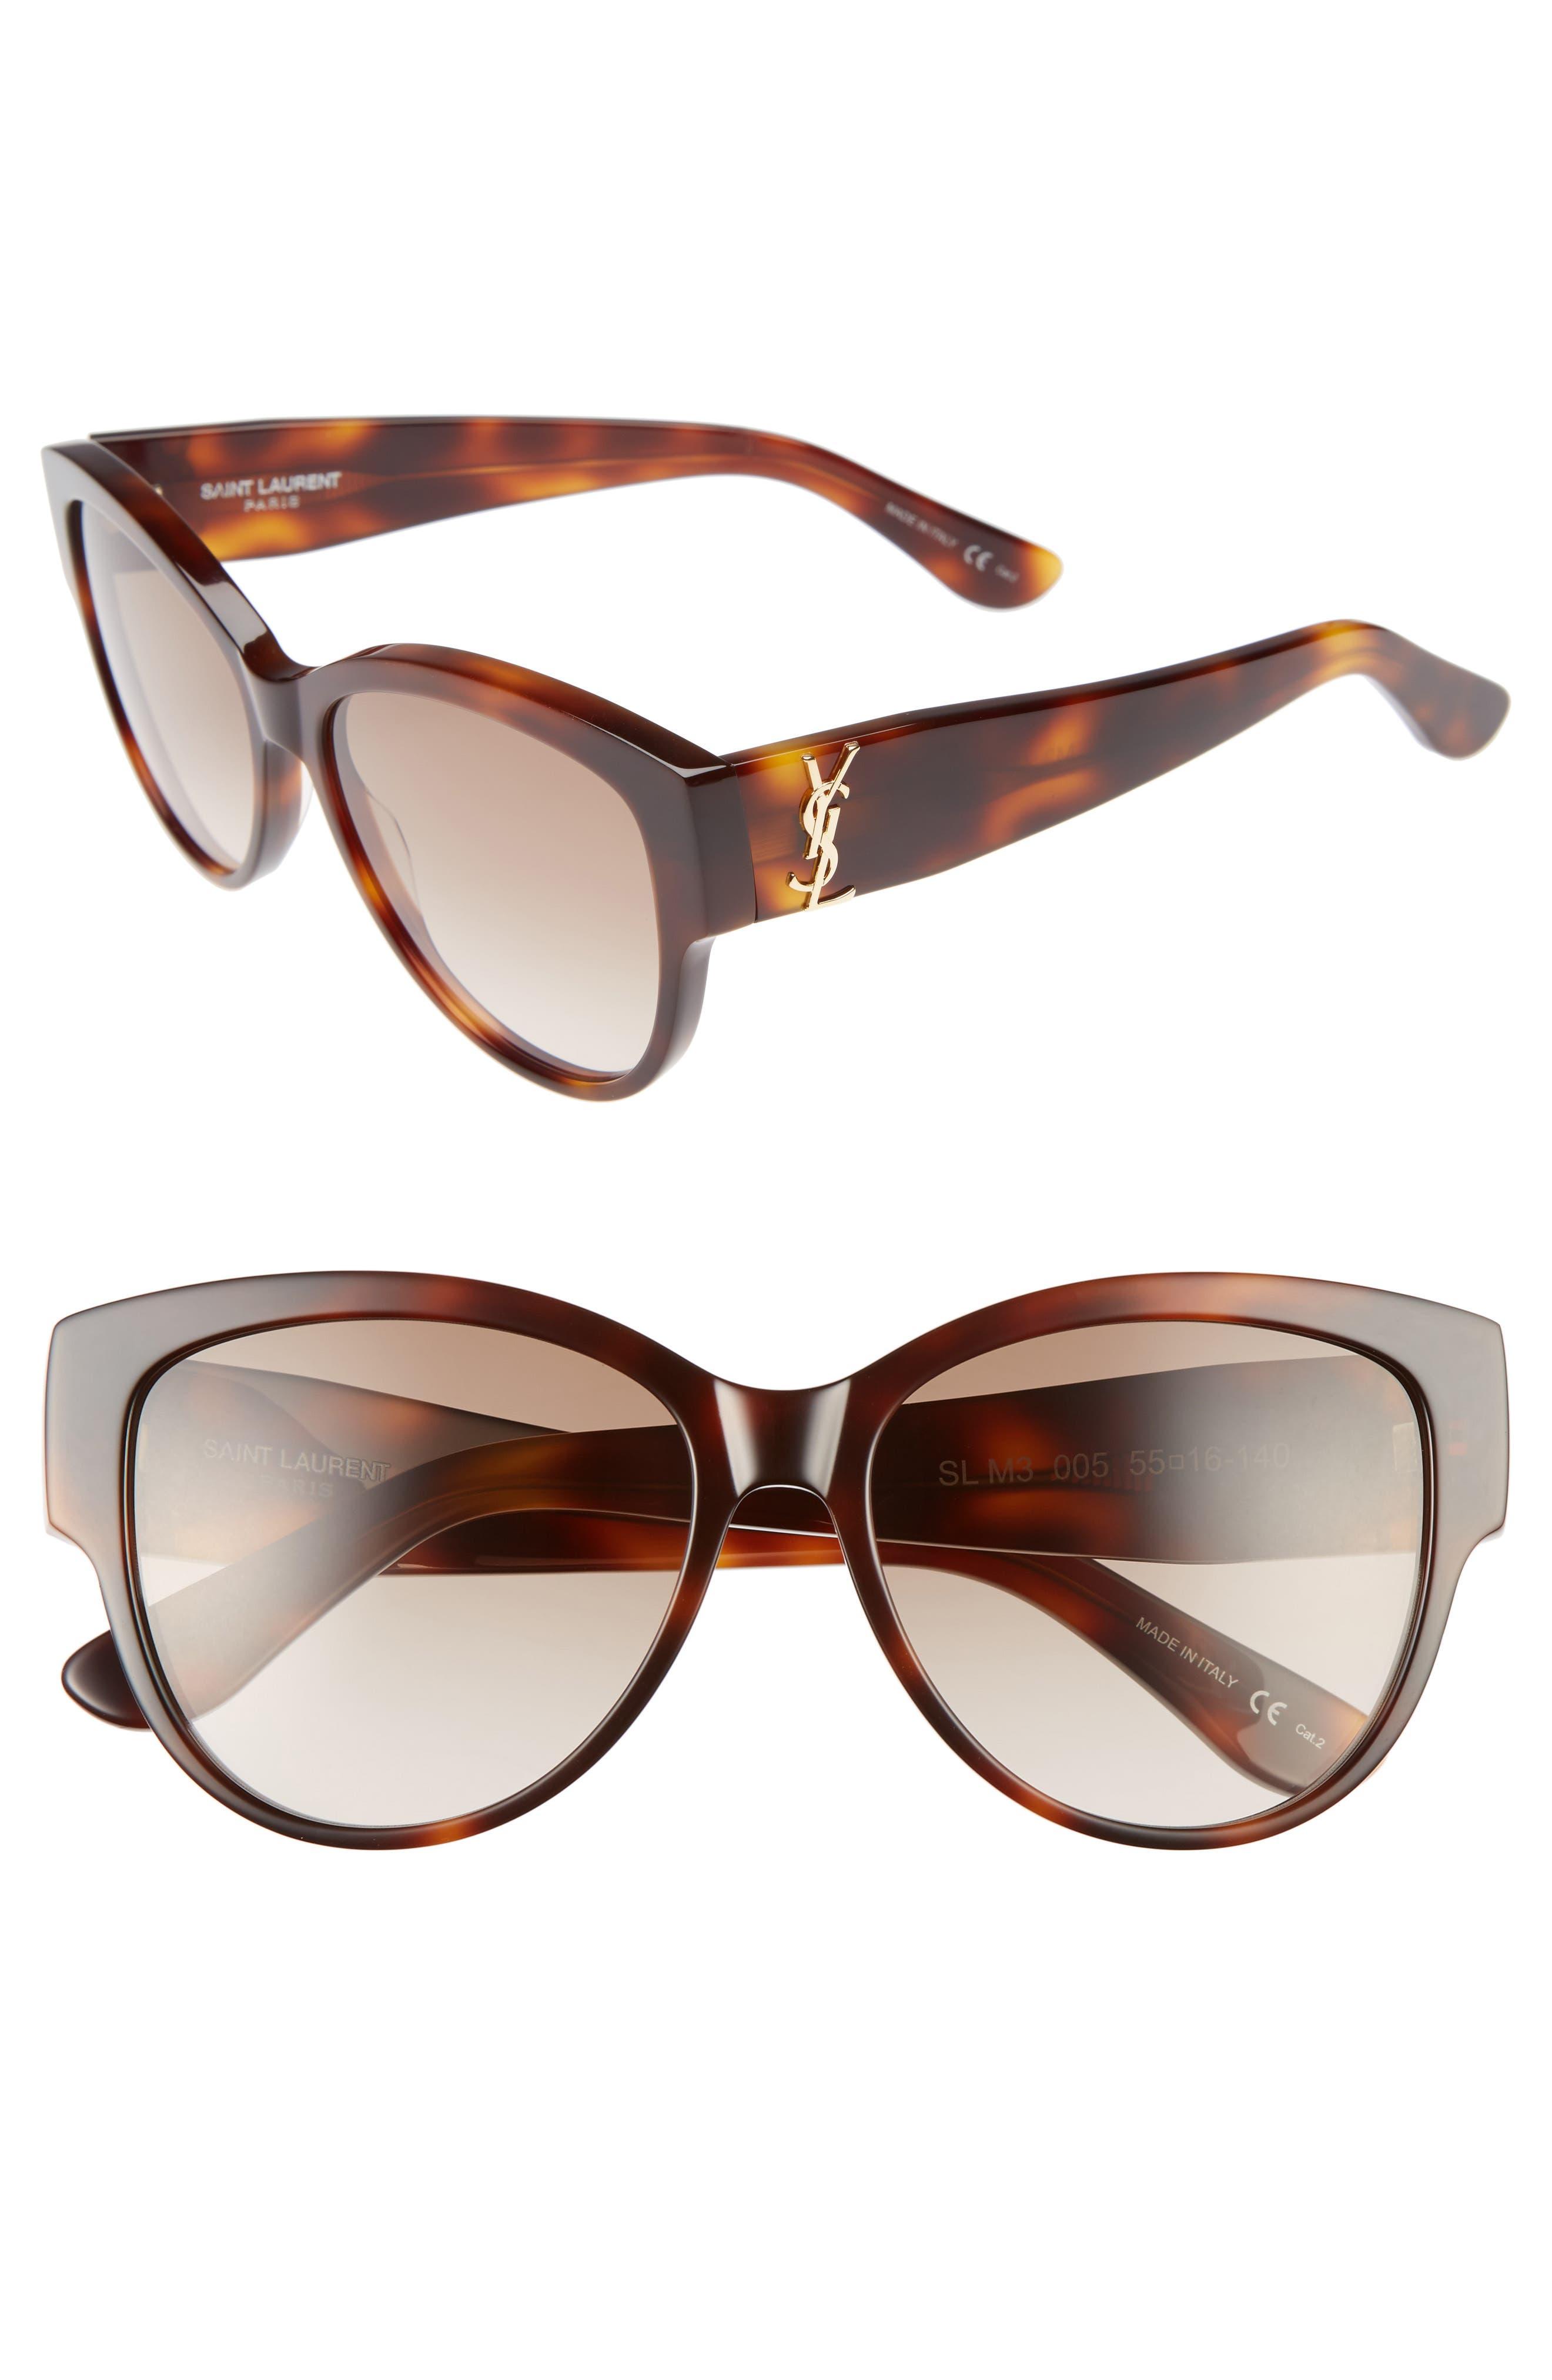 Alternate Image 1 Selected - Saint Laurent 55mm Cat Eye Sunglasses